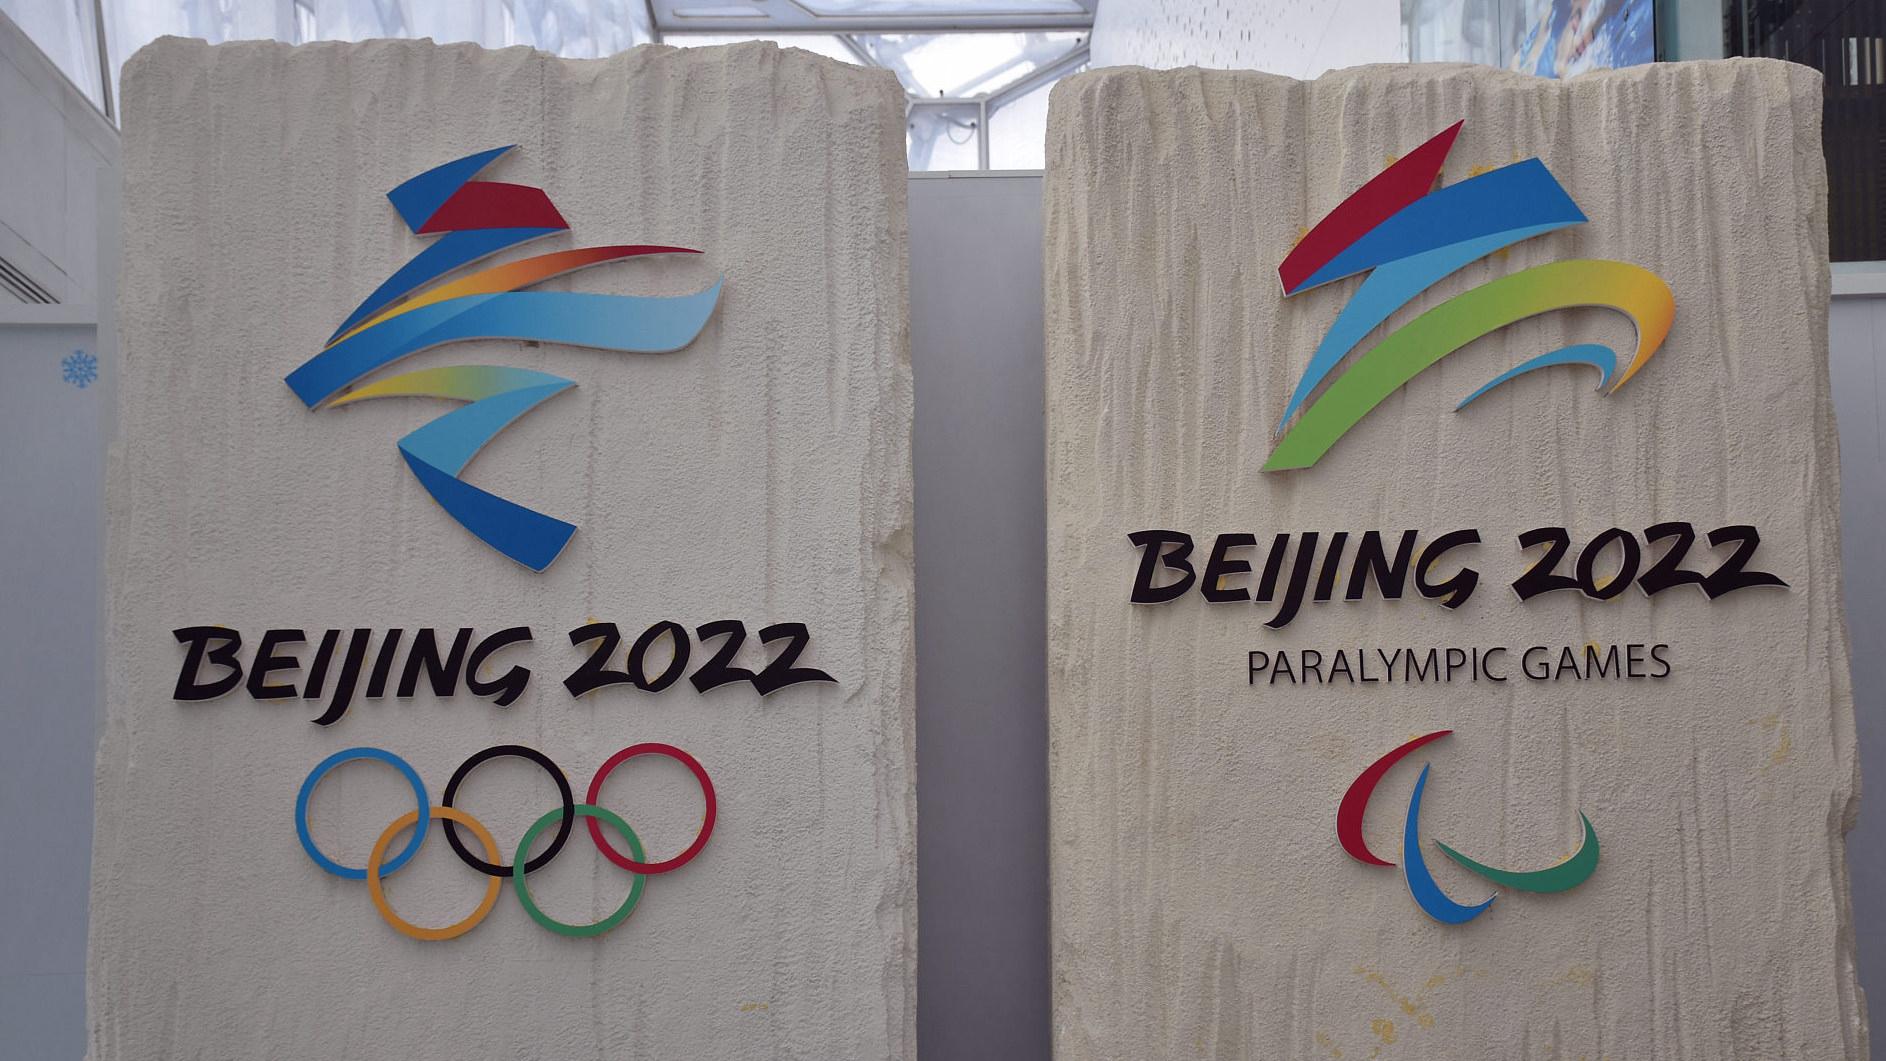 IOC Vice President sure of 'extraordinary' Beijing Olympics